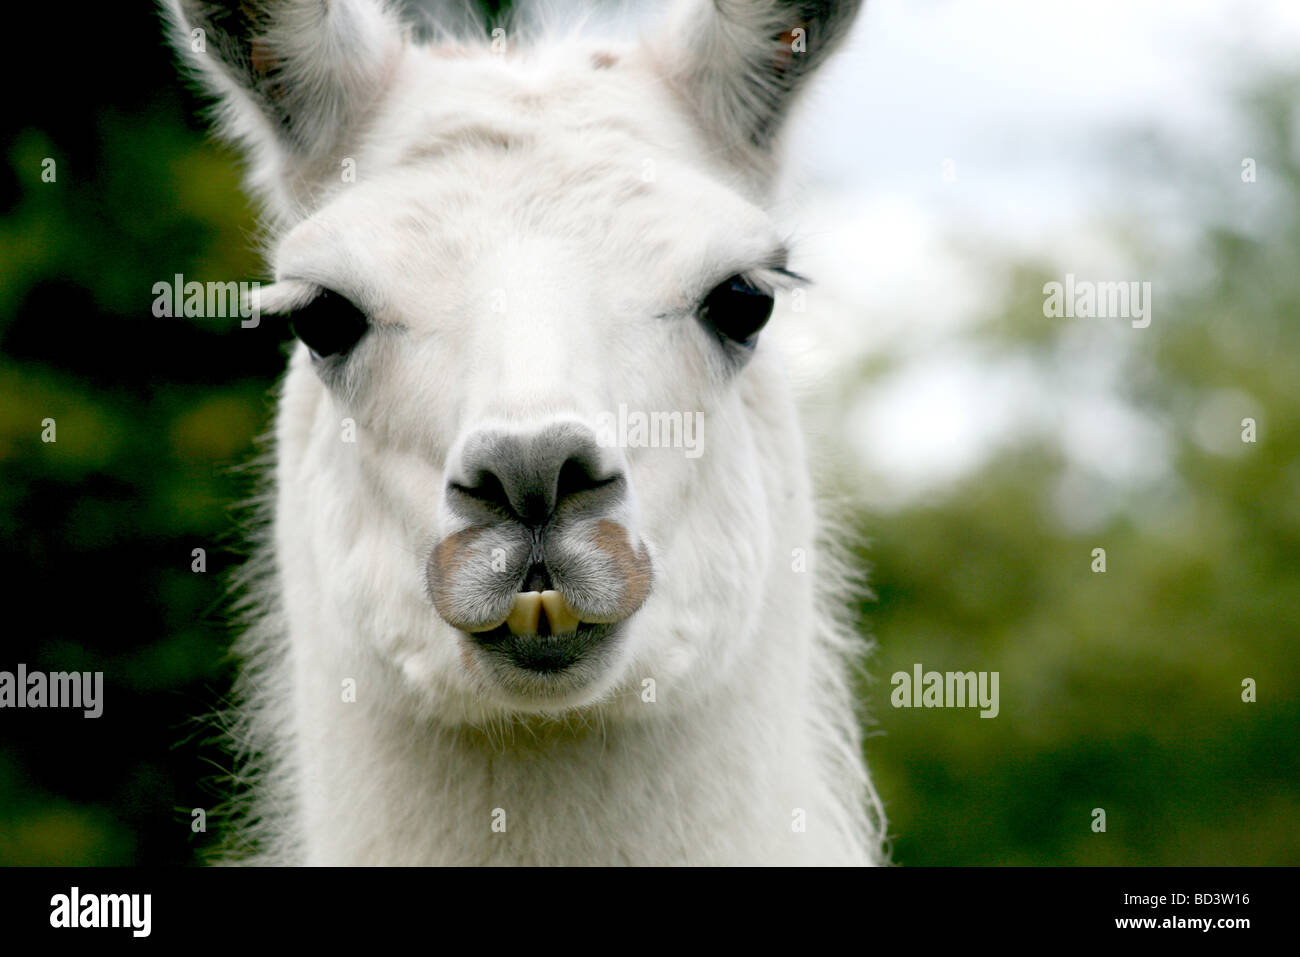 Beautiful White Llama Of Mudchute Park And Farm Isle Of Dogs Stock